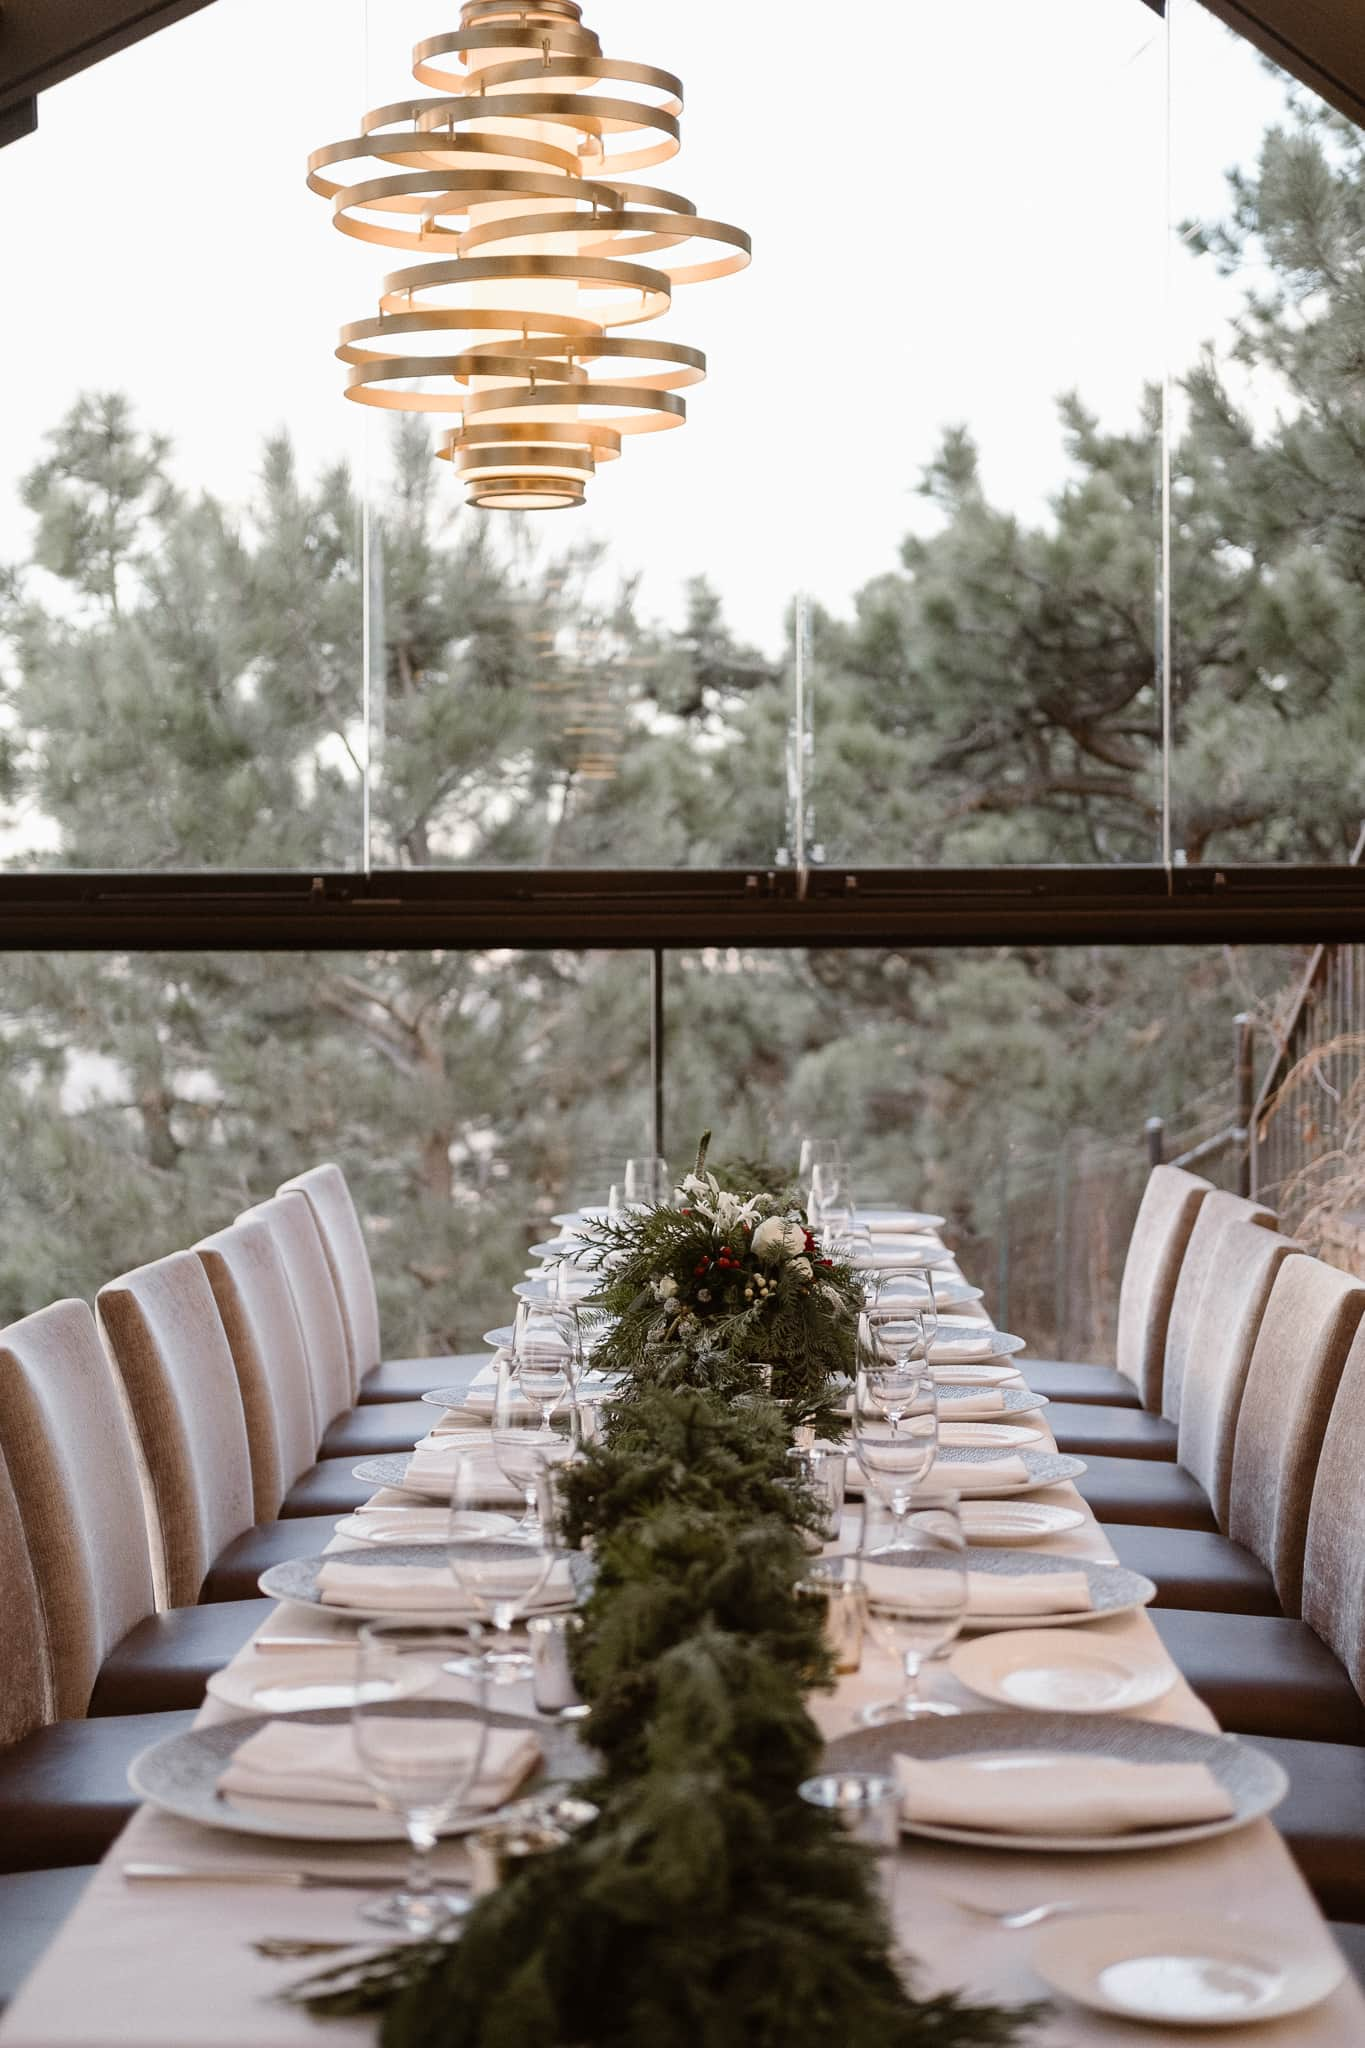 Flagstaff House wedding reception, Boulder intimate wedding, Christmas themed wedding reception decor